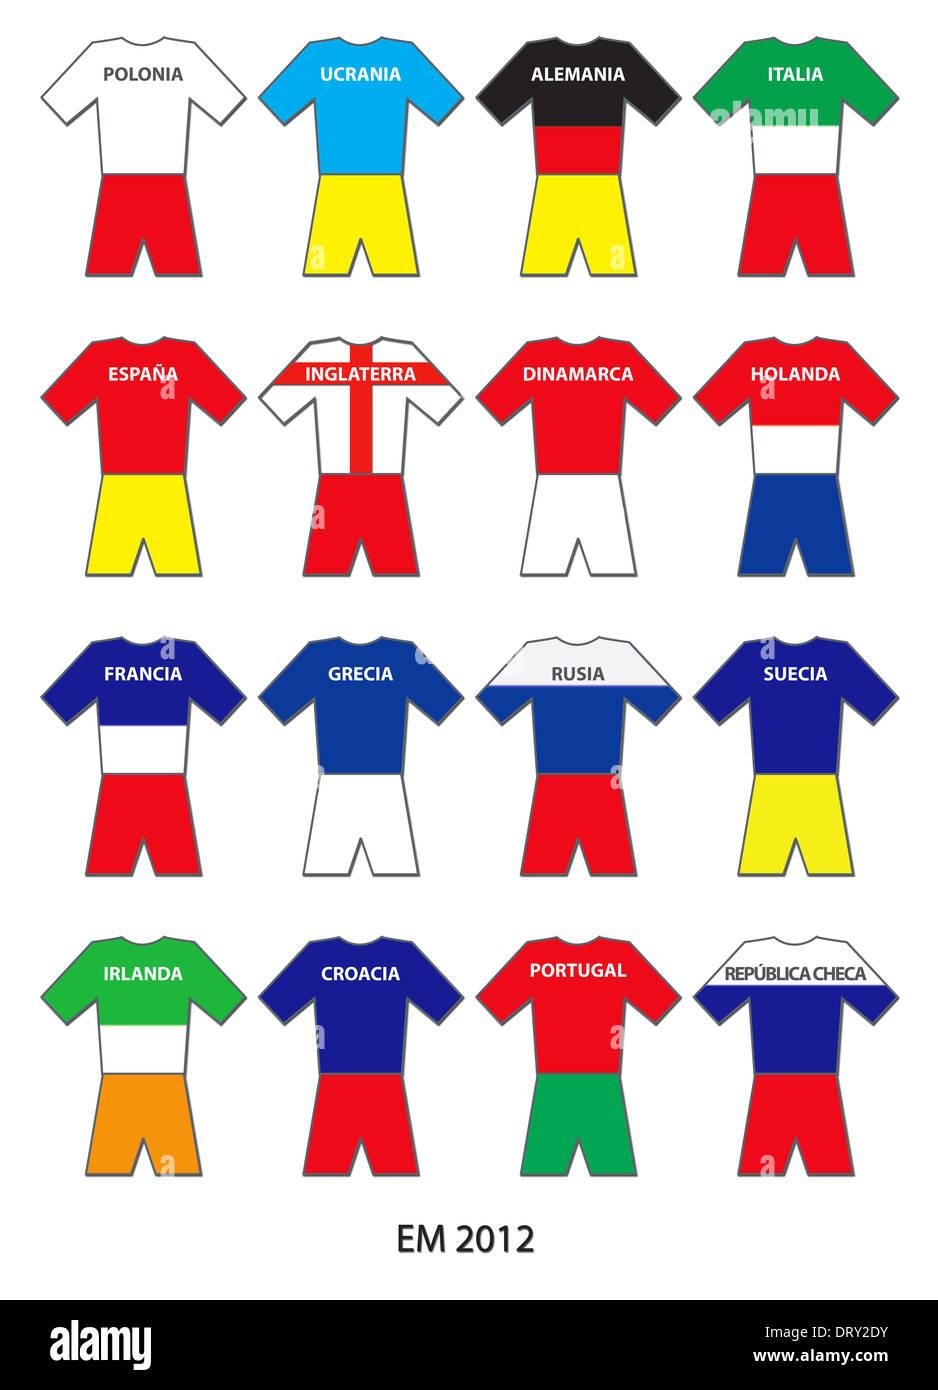 EM 2012 Teams - ESPAÑOL - Stock Image